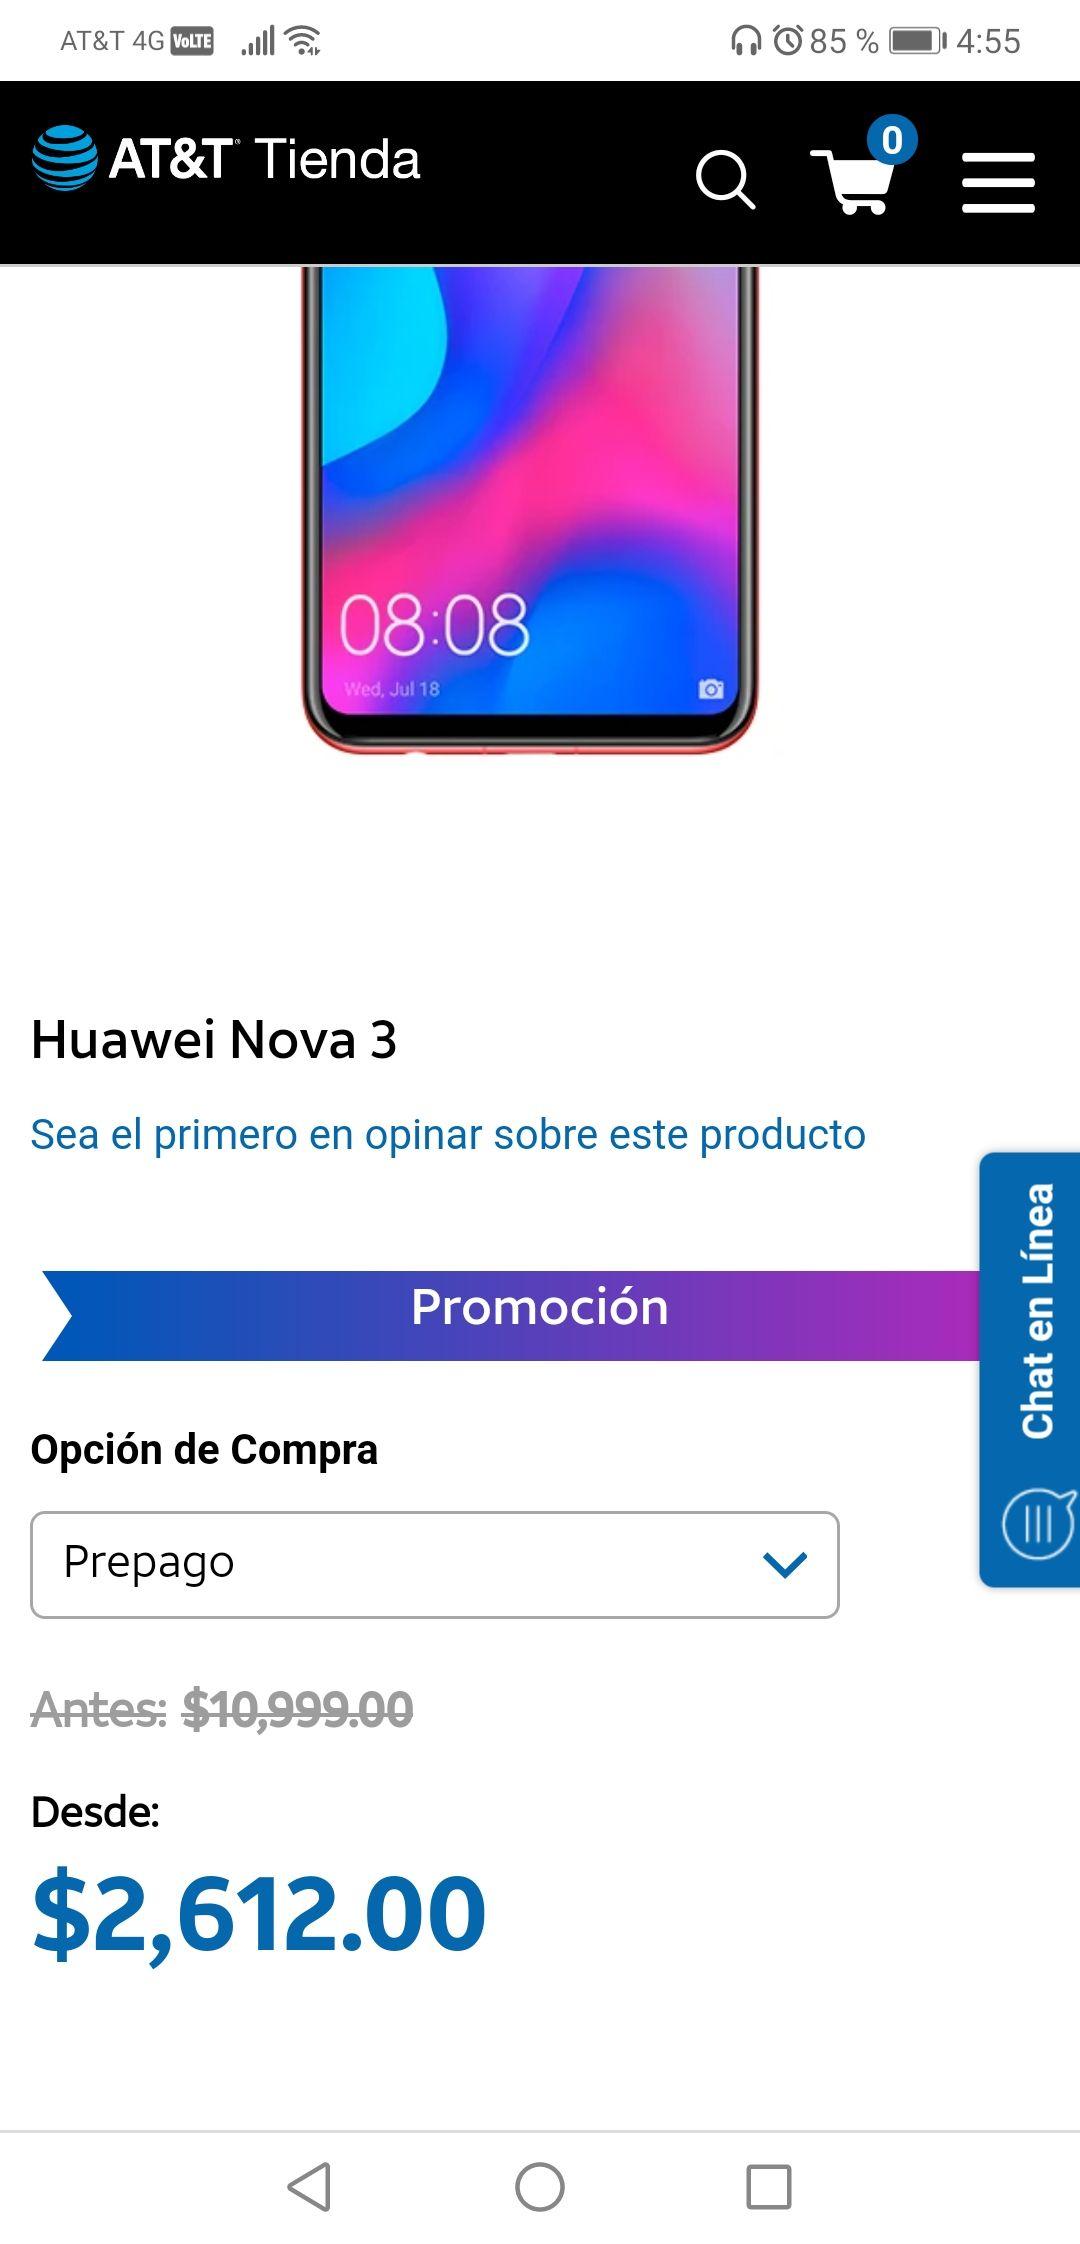 AT&T: Huawei Nova 3 $2612